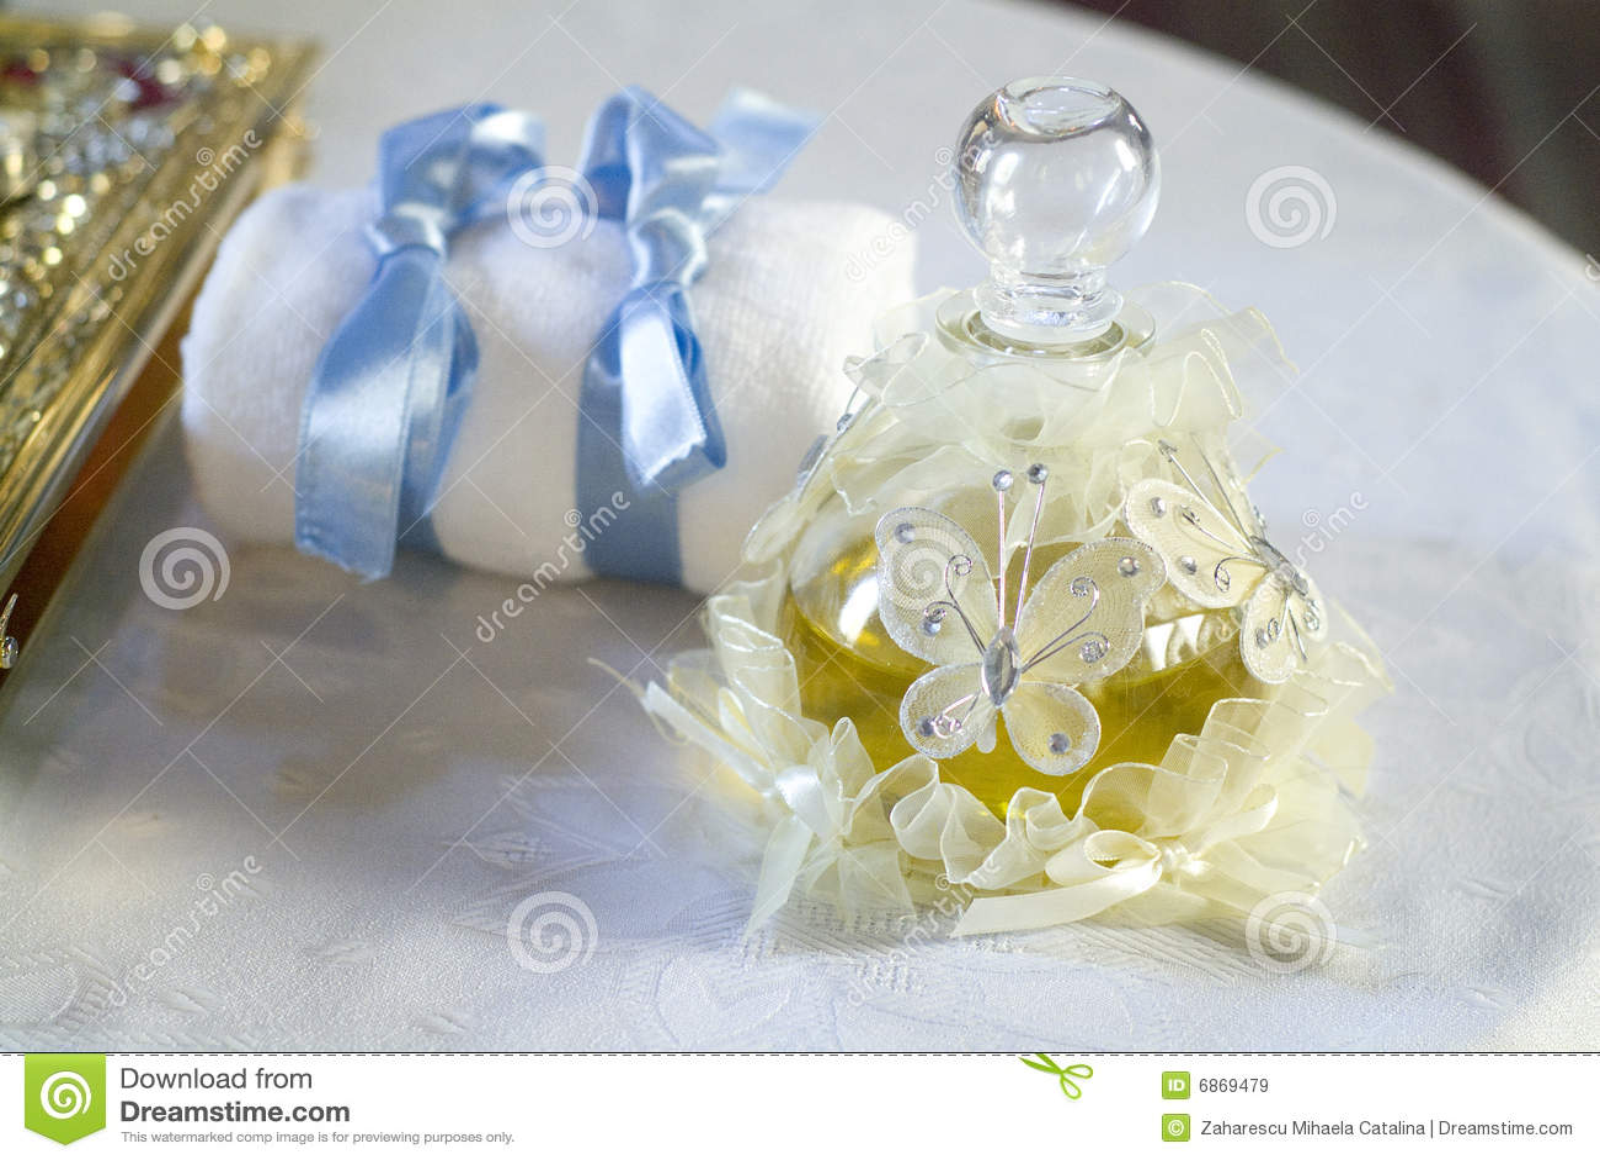 масло крещения младенца